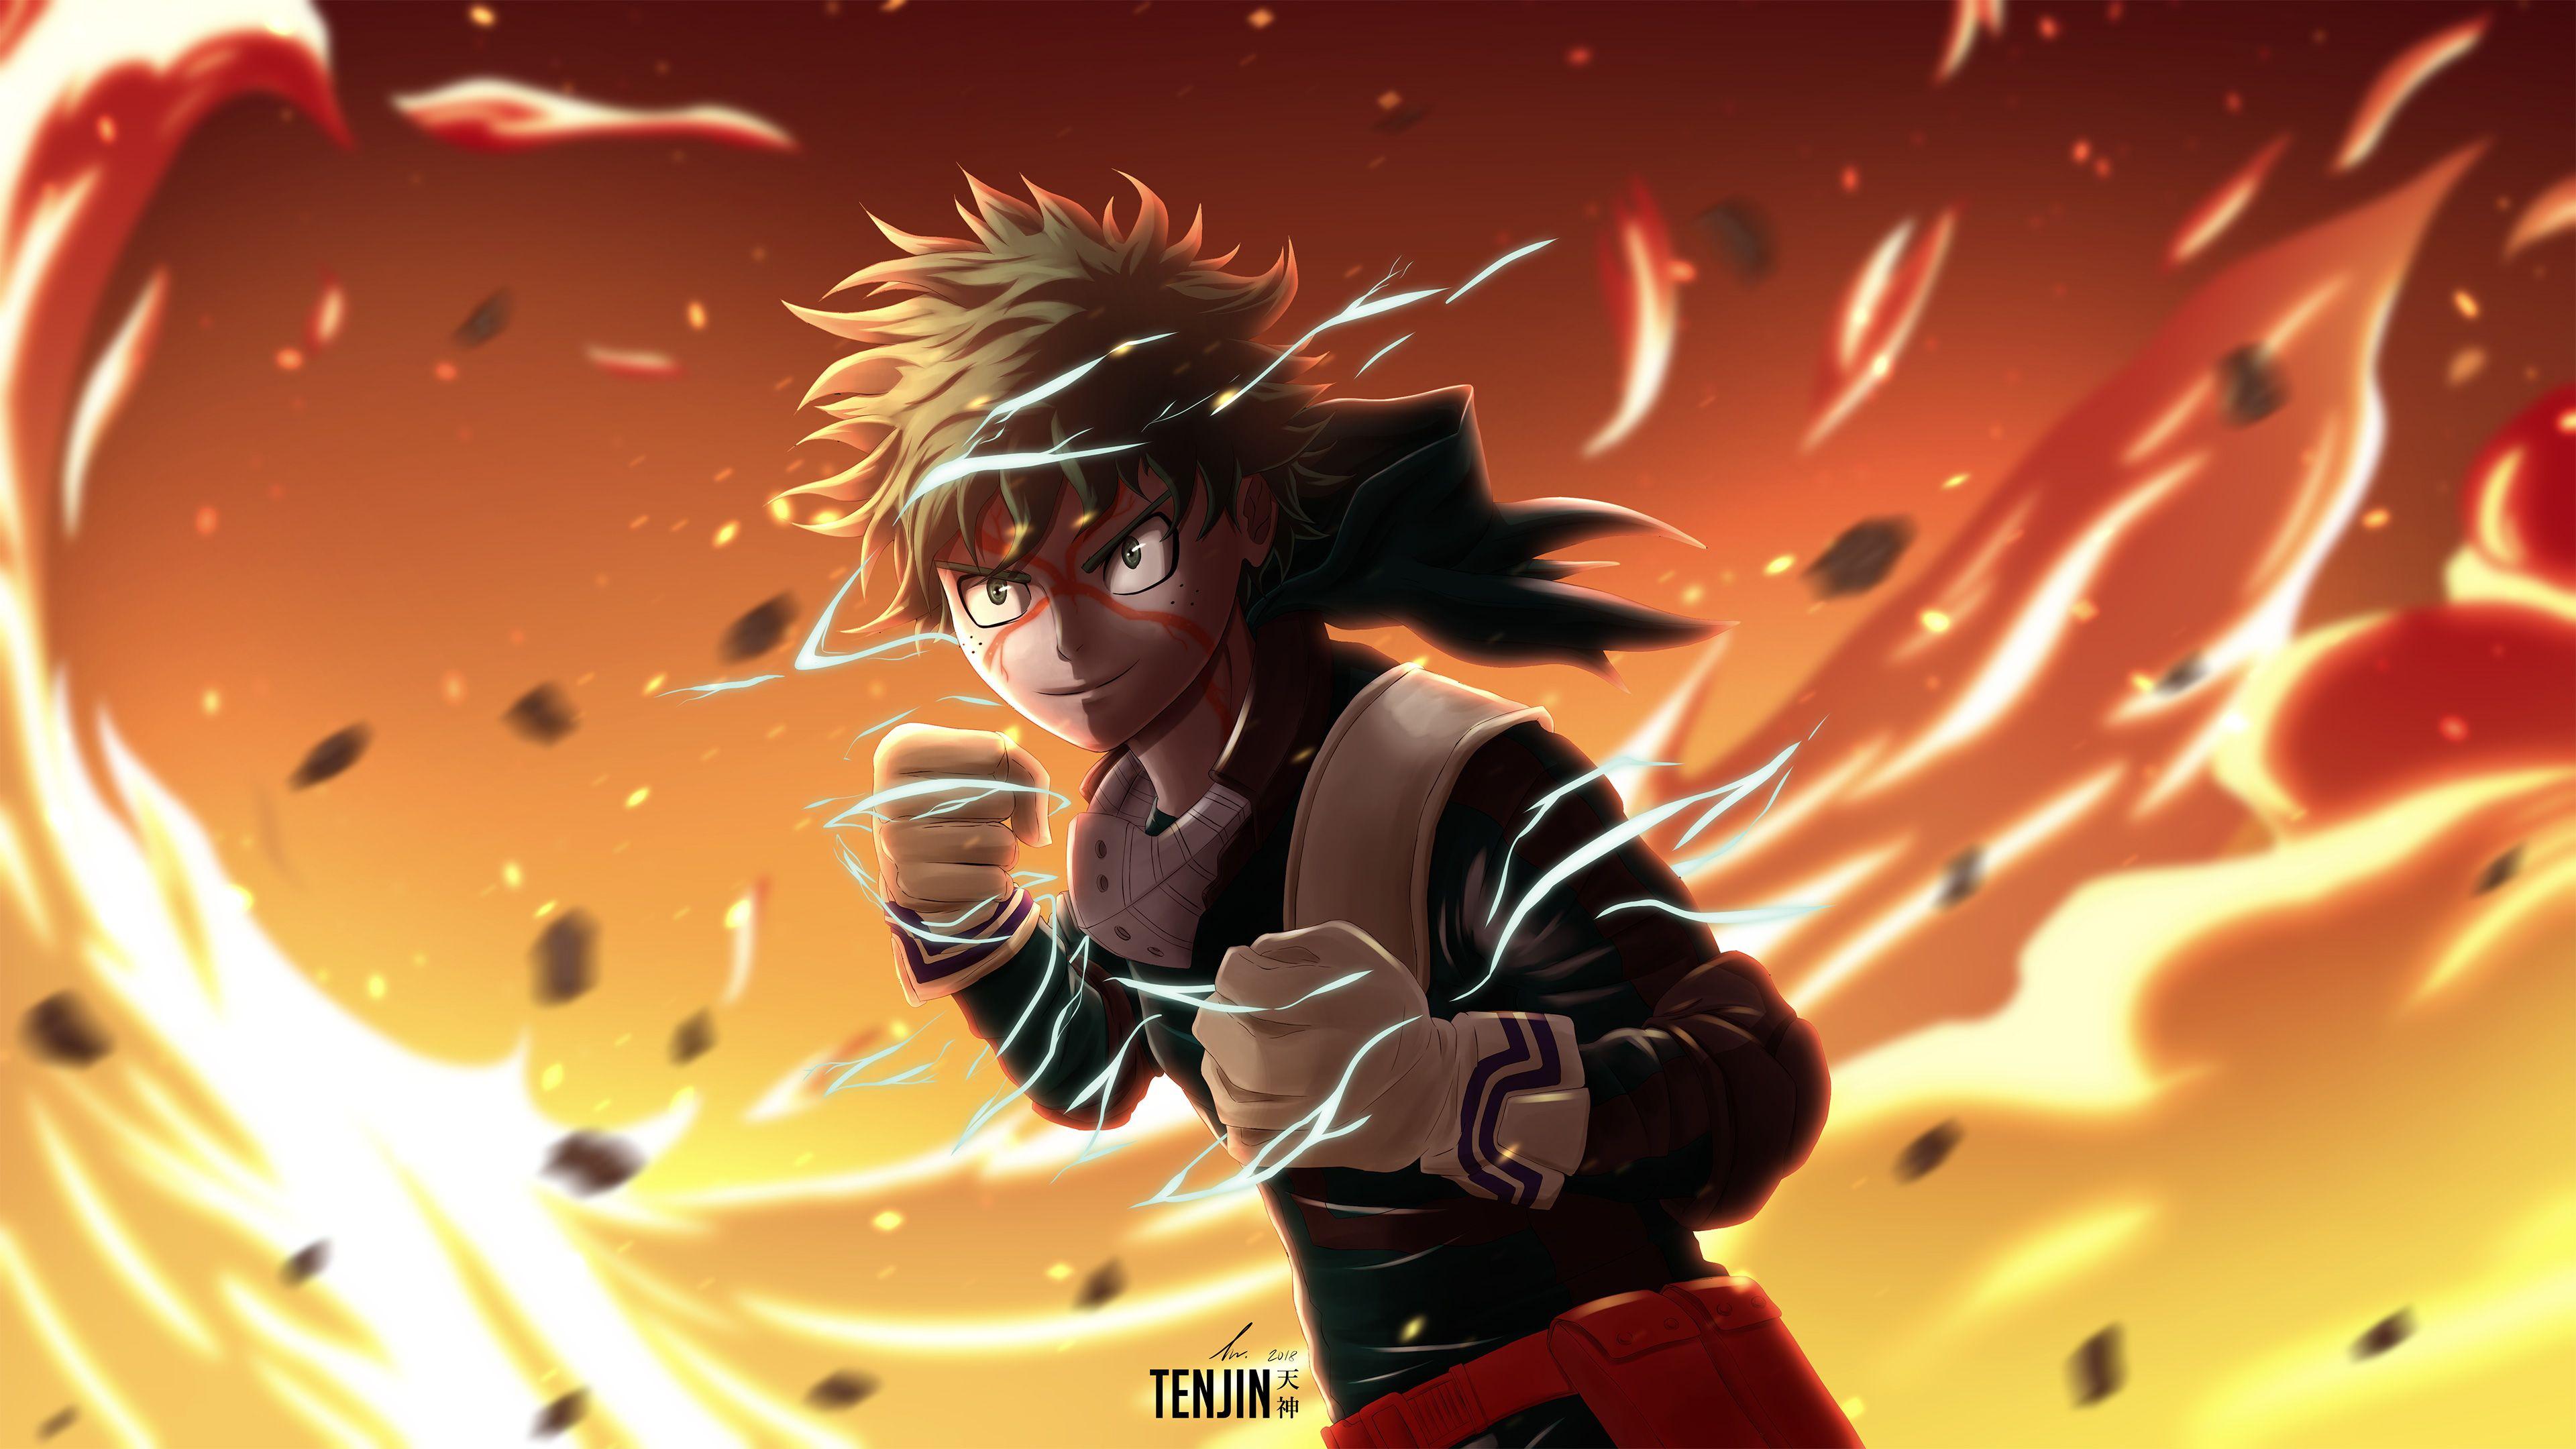 Deku My Hero Academia 4K Wallpapers   Top Deku My Hero 3840x2160